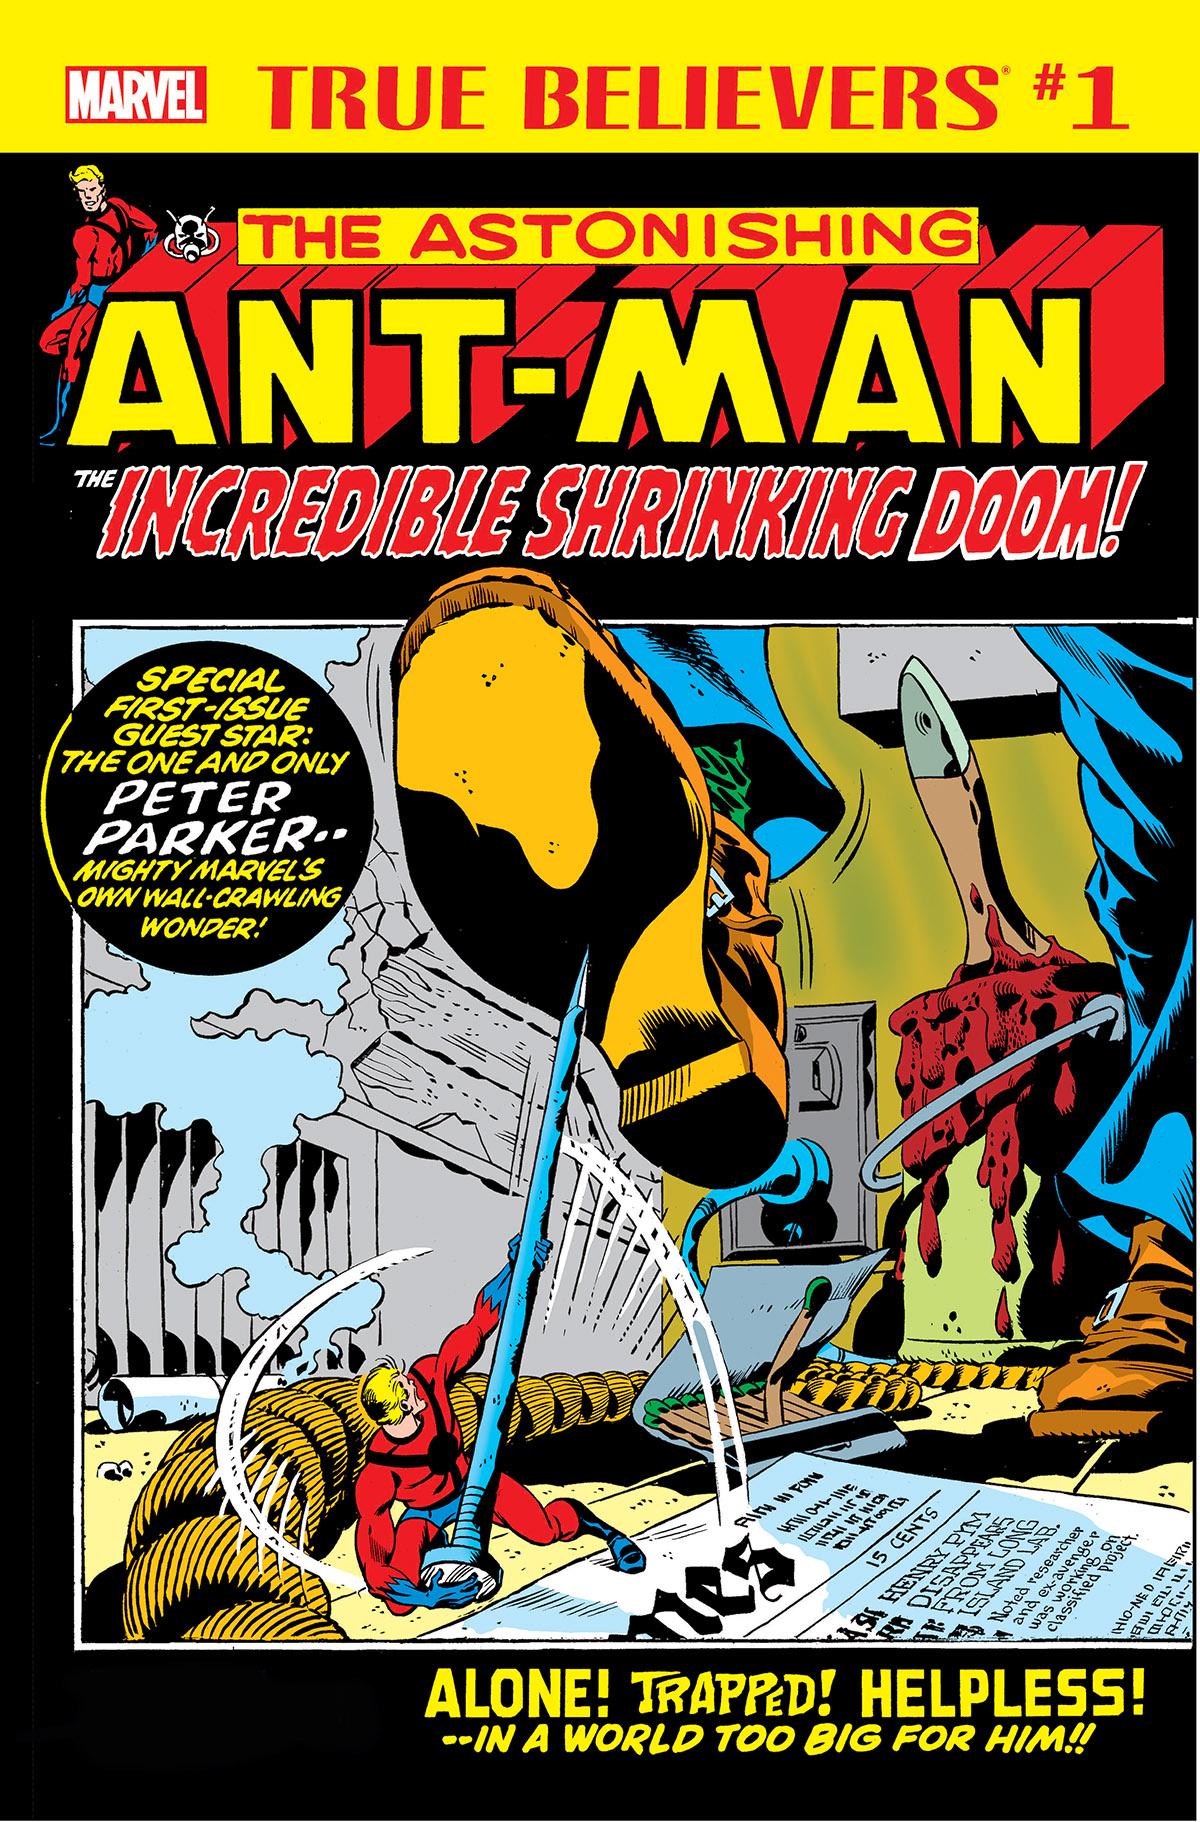 True Believers: Ant-Man - The Incredible Shrinking Doom Vol 1